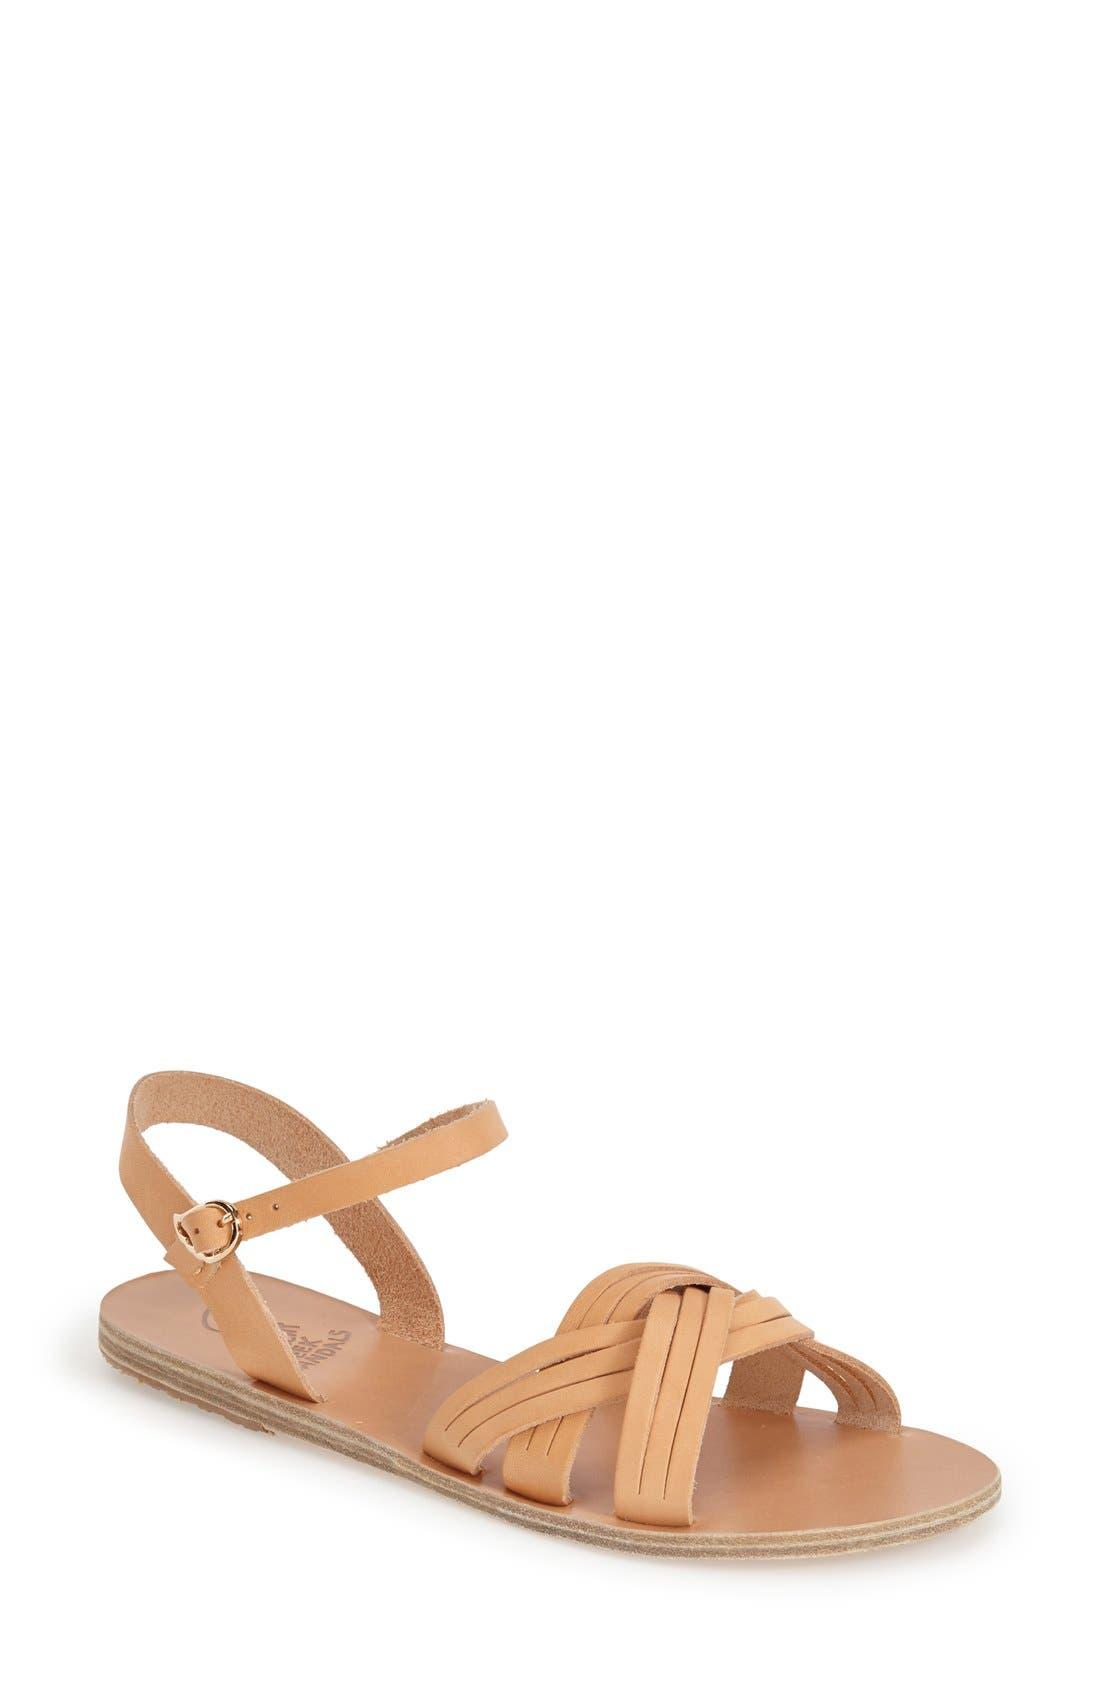 Main Image - Ancient Greek Sandals 'Electra' Quarter Strap Sandal (Women)